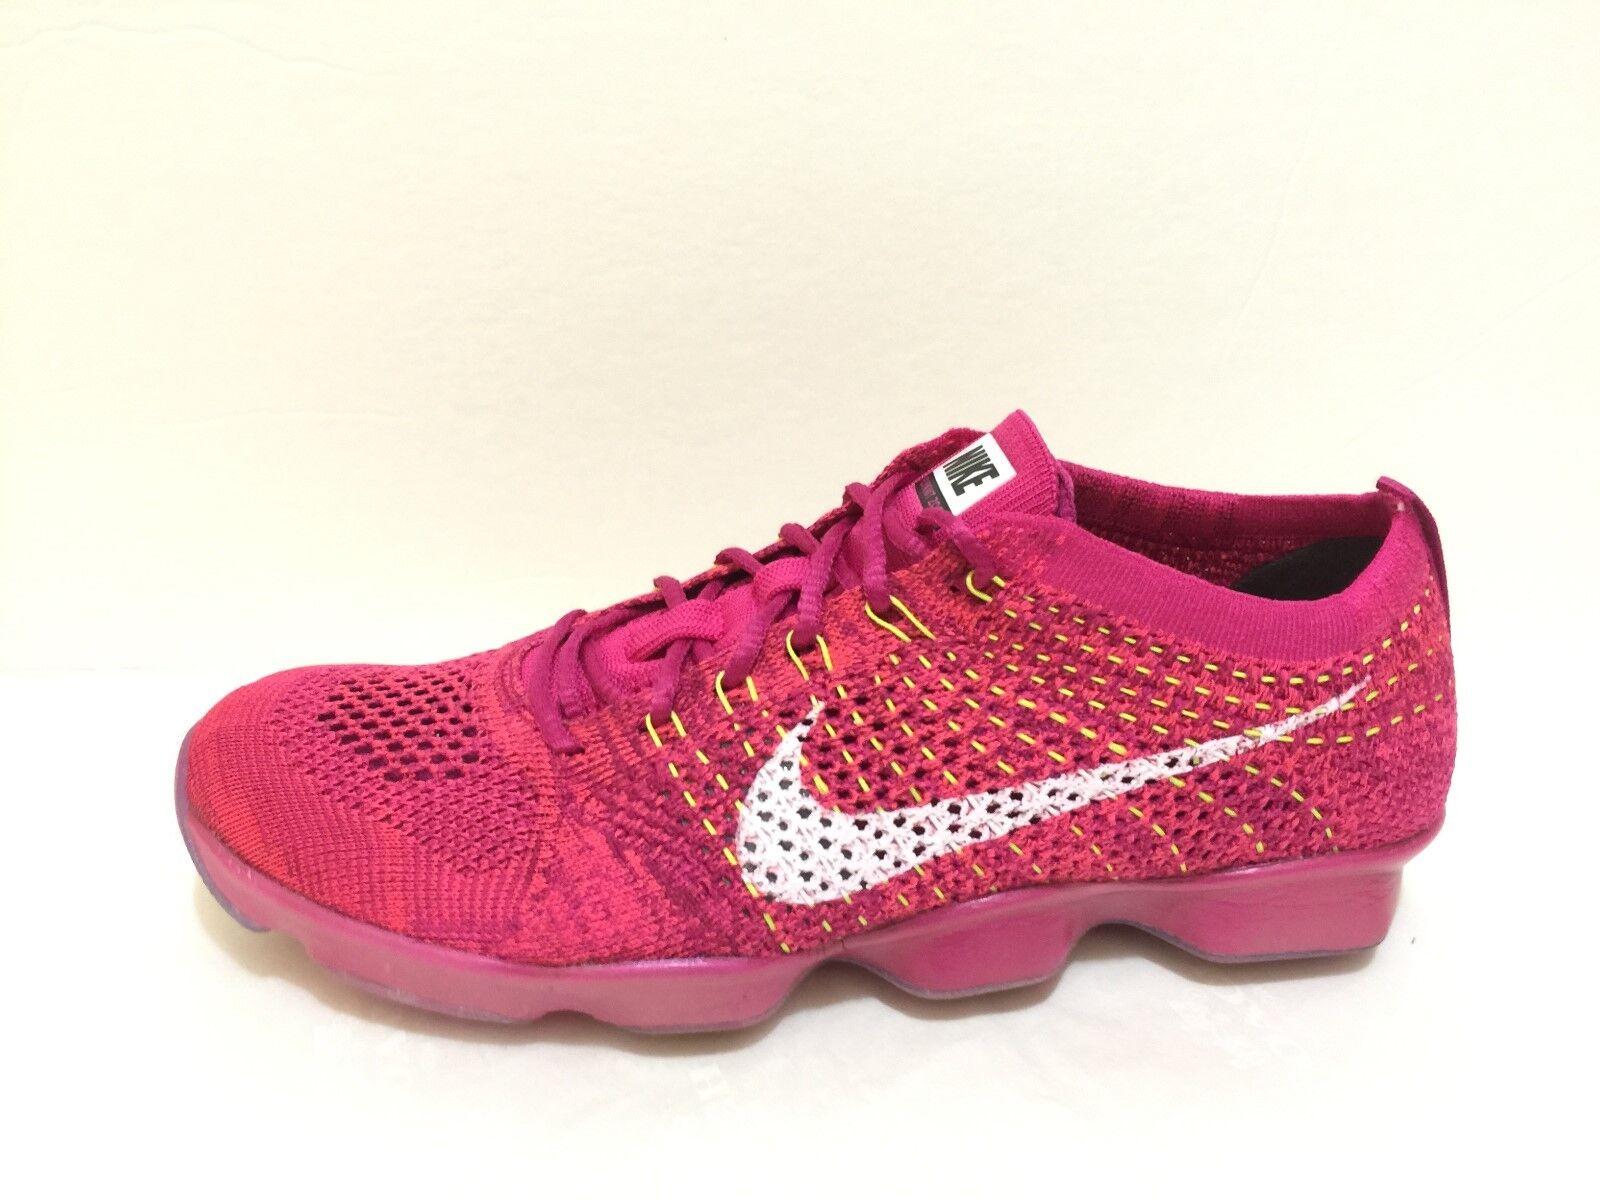 New Women's Nike Flyknit Zoom Agility Training Shoes 698616600 Size 8.5